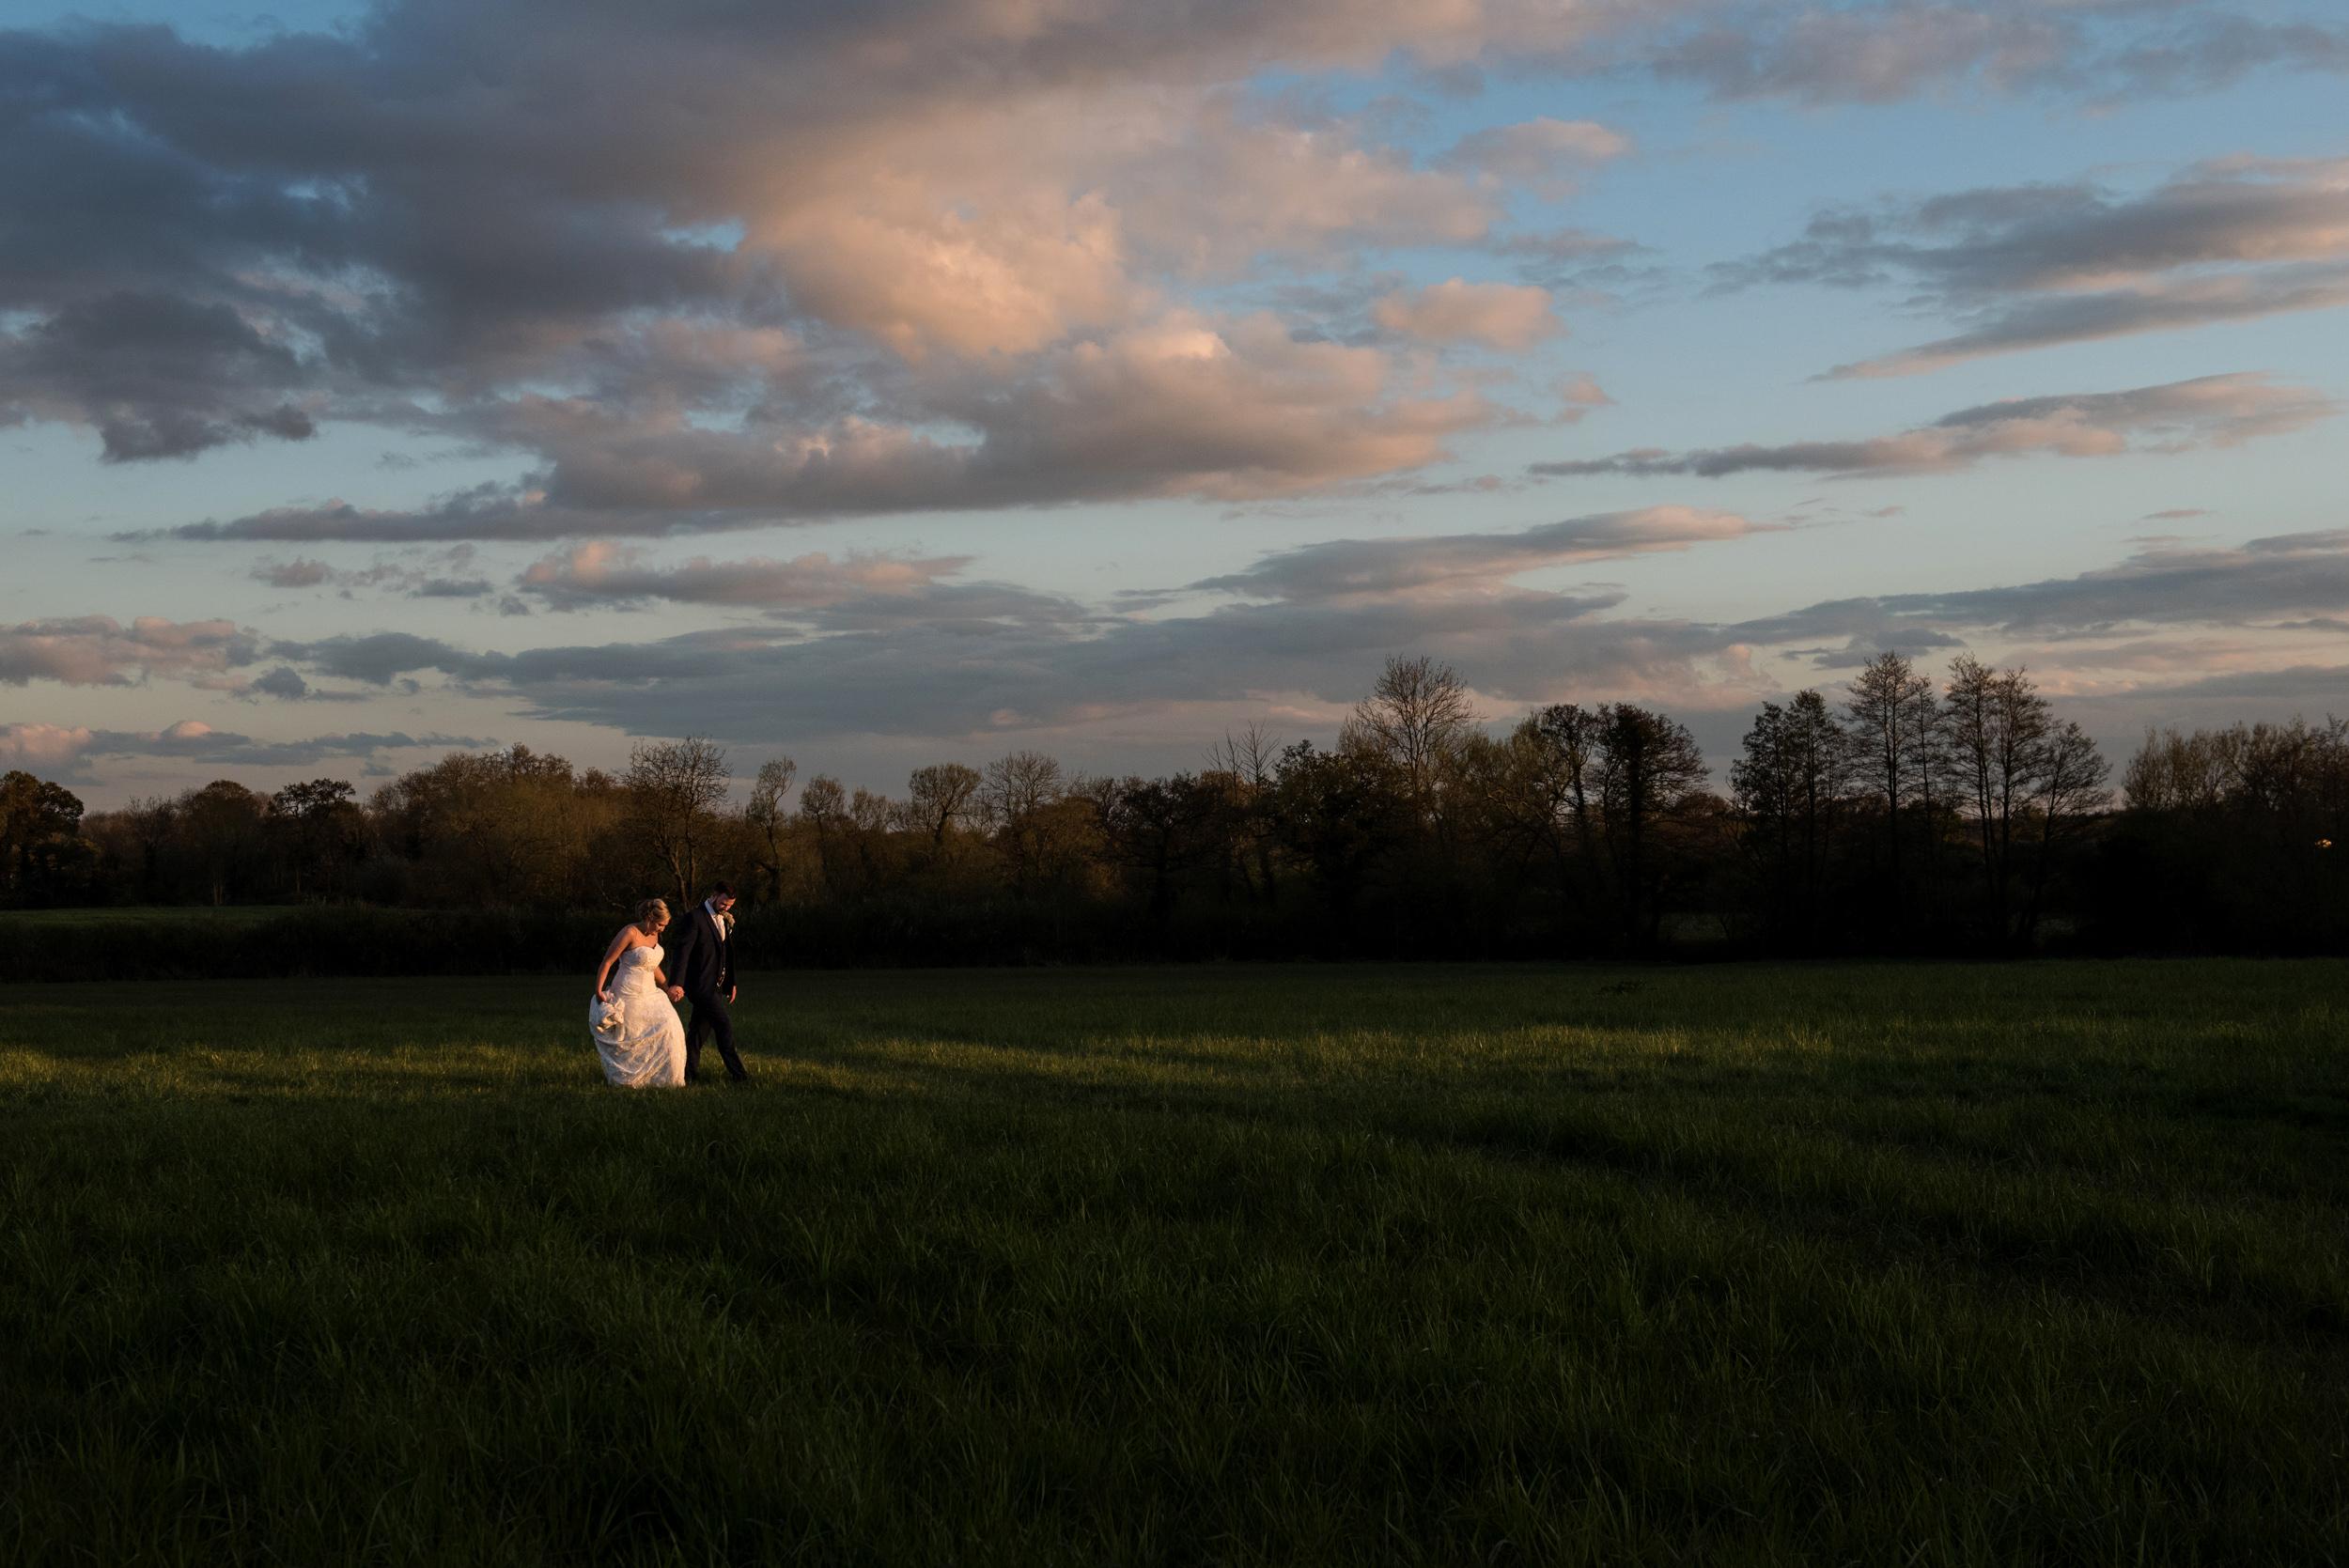 David Scholes Lancashire wedding photography 2016-74.jpg